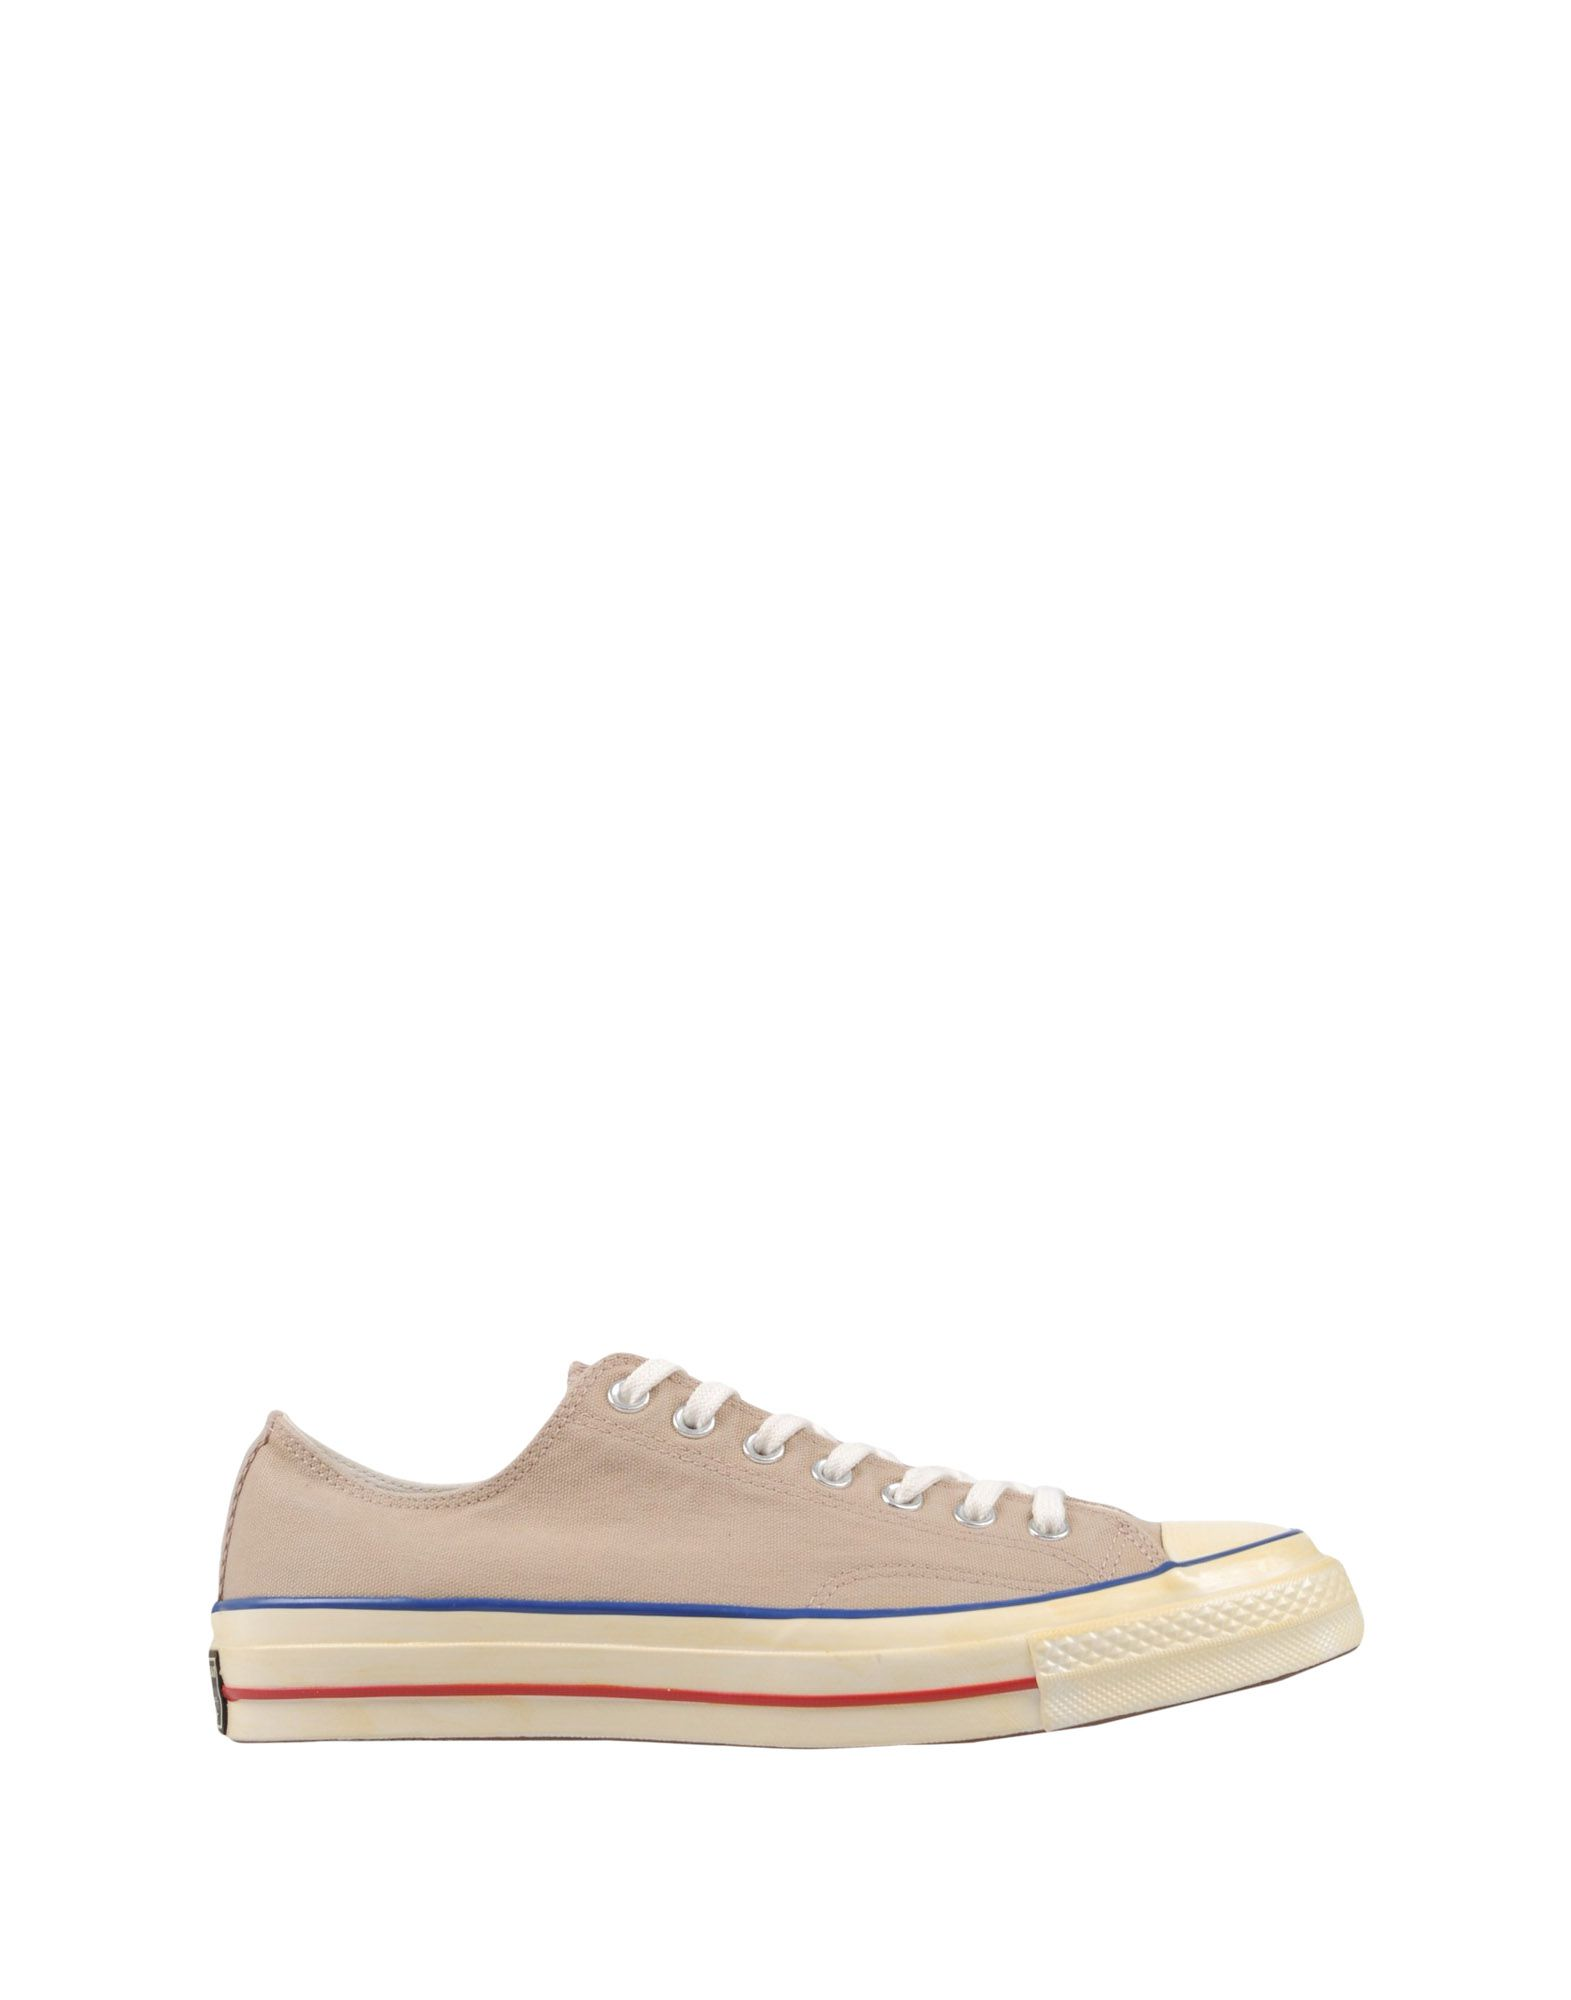 Rabatt echte Schuhe Converse All Star Ctas Canvas Ox 70'S Vintage '36 Canvas Ctas  11437525AX e3993a